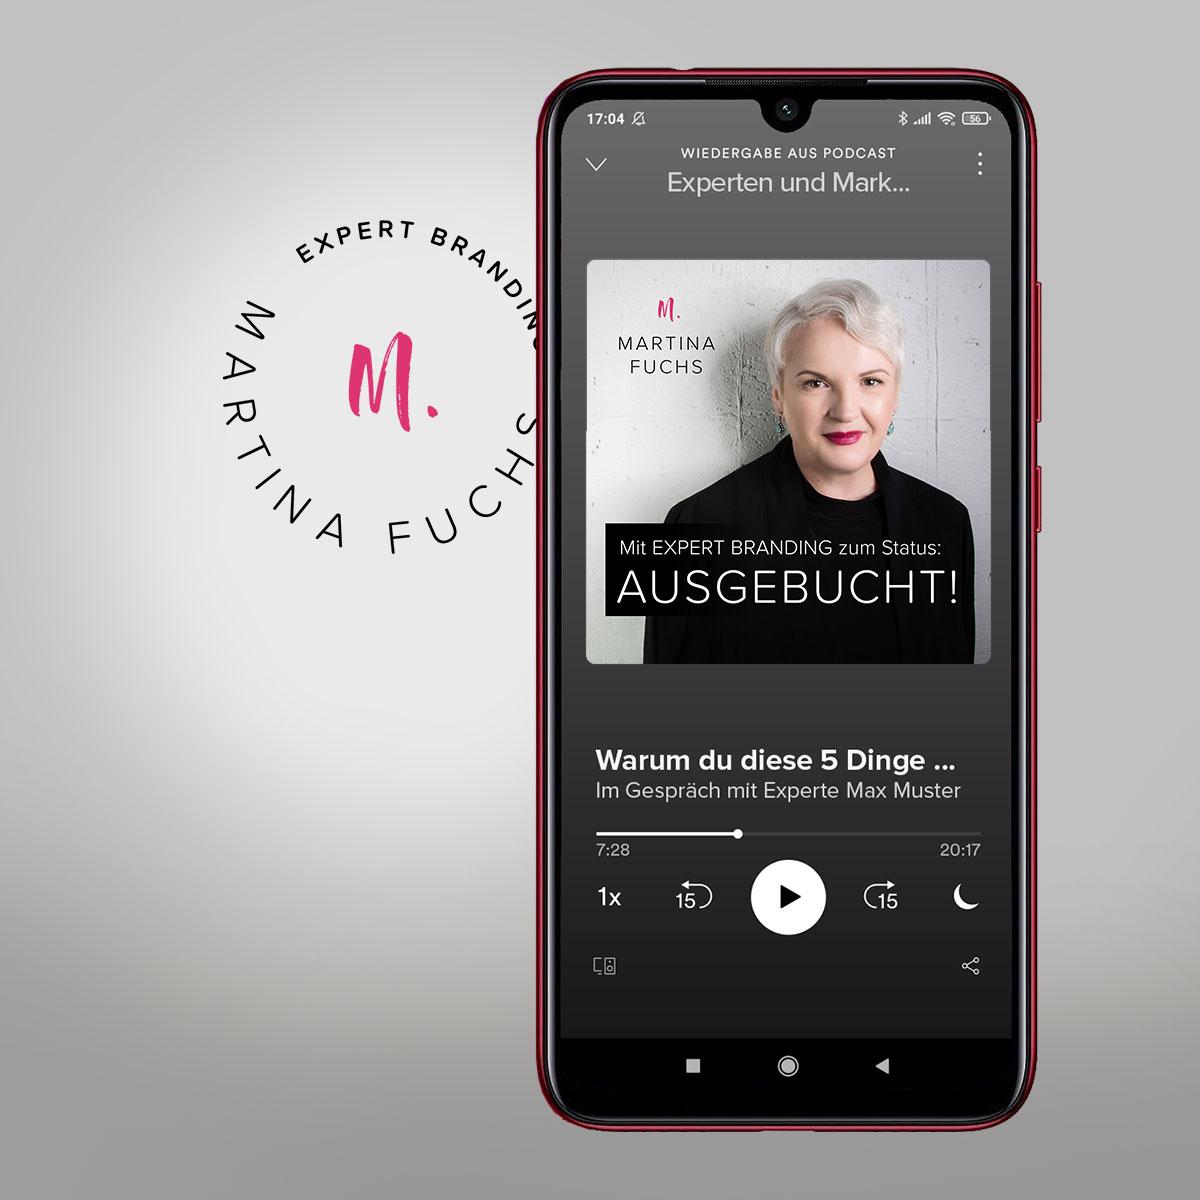 Martina Fuchs Podcast